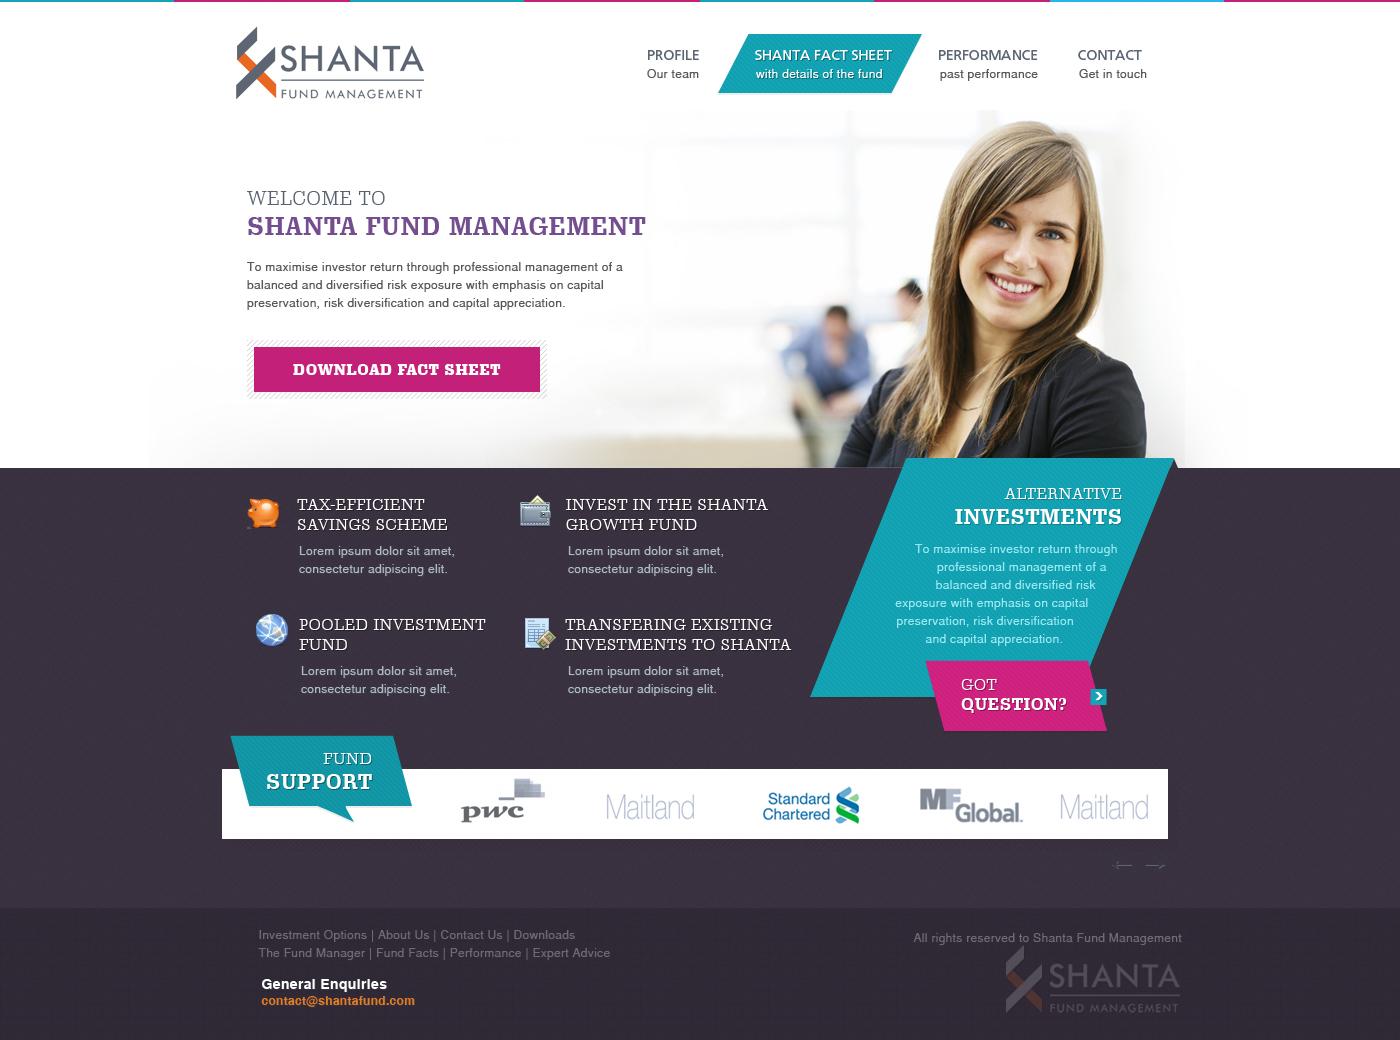 Shanta fund 2 by prkdeviant